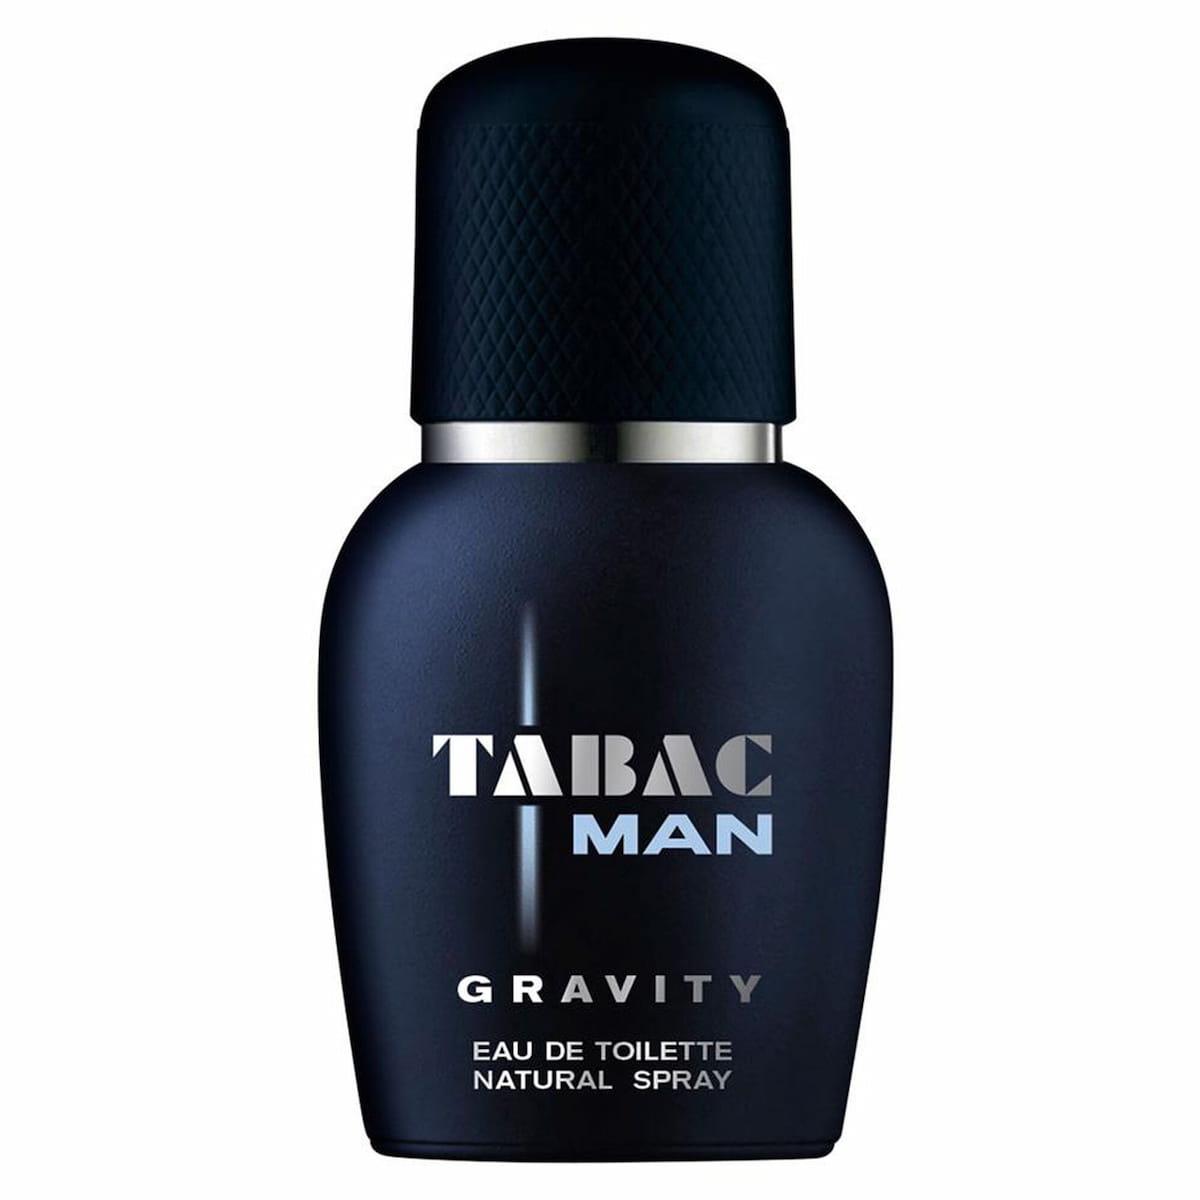 Tabac - Tabac Man Gravity - Eau de Toilette